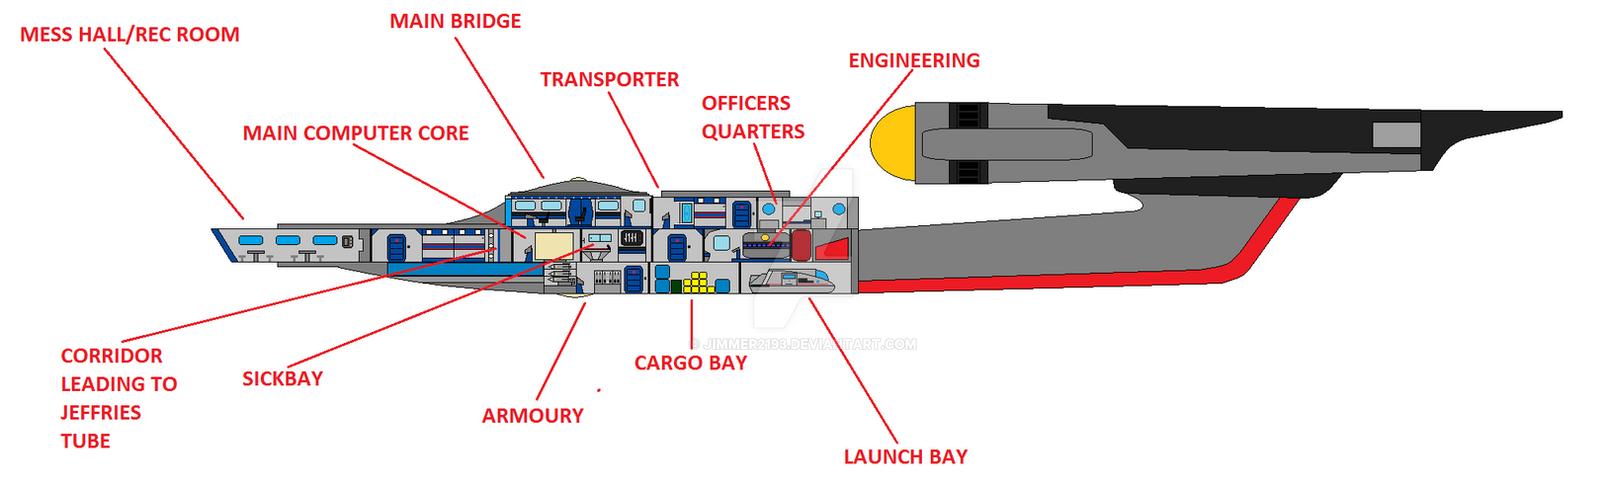 STARSHIP CLASS USS FRANKLIN Deck Plan 624209941 on Spaceship Deck Plans